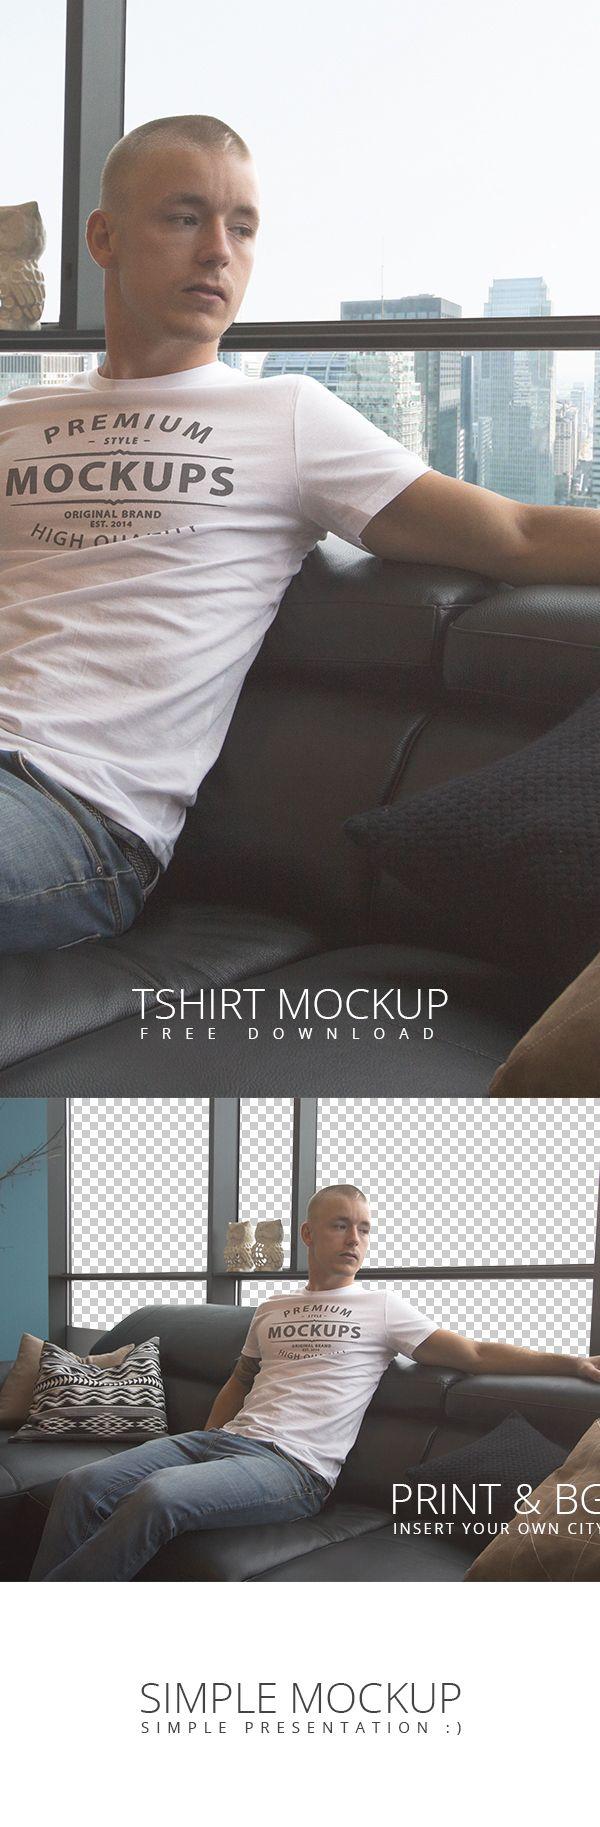 T-shirt design kit free download - T Shirt Psd Mockup Free Download